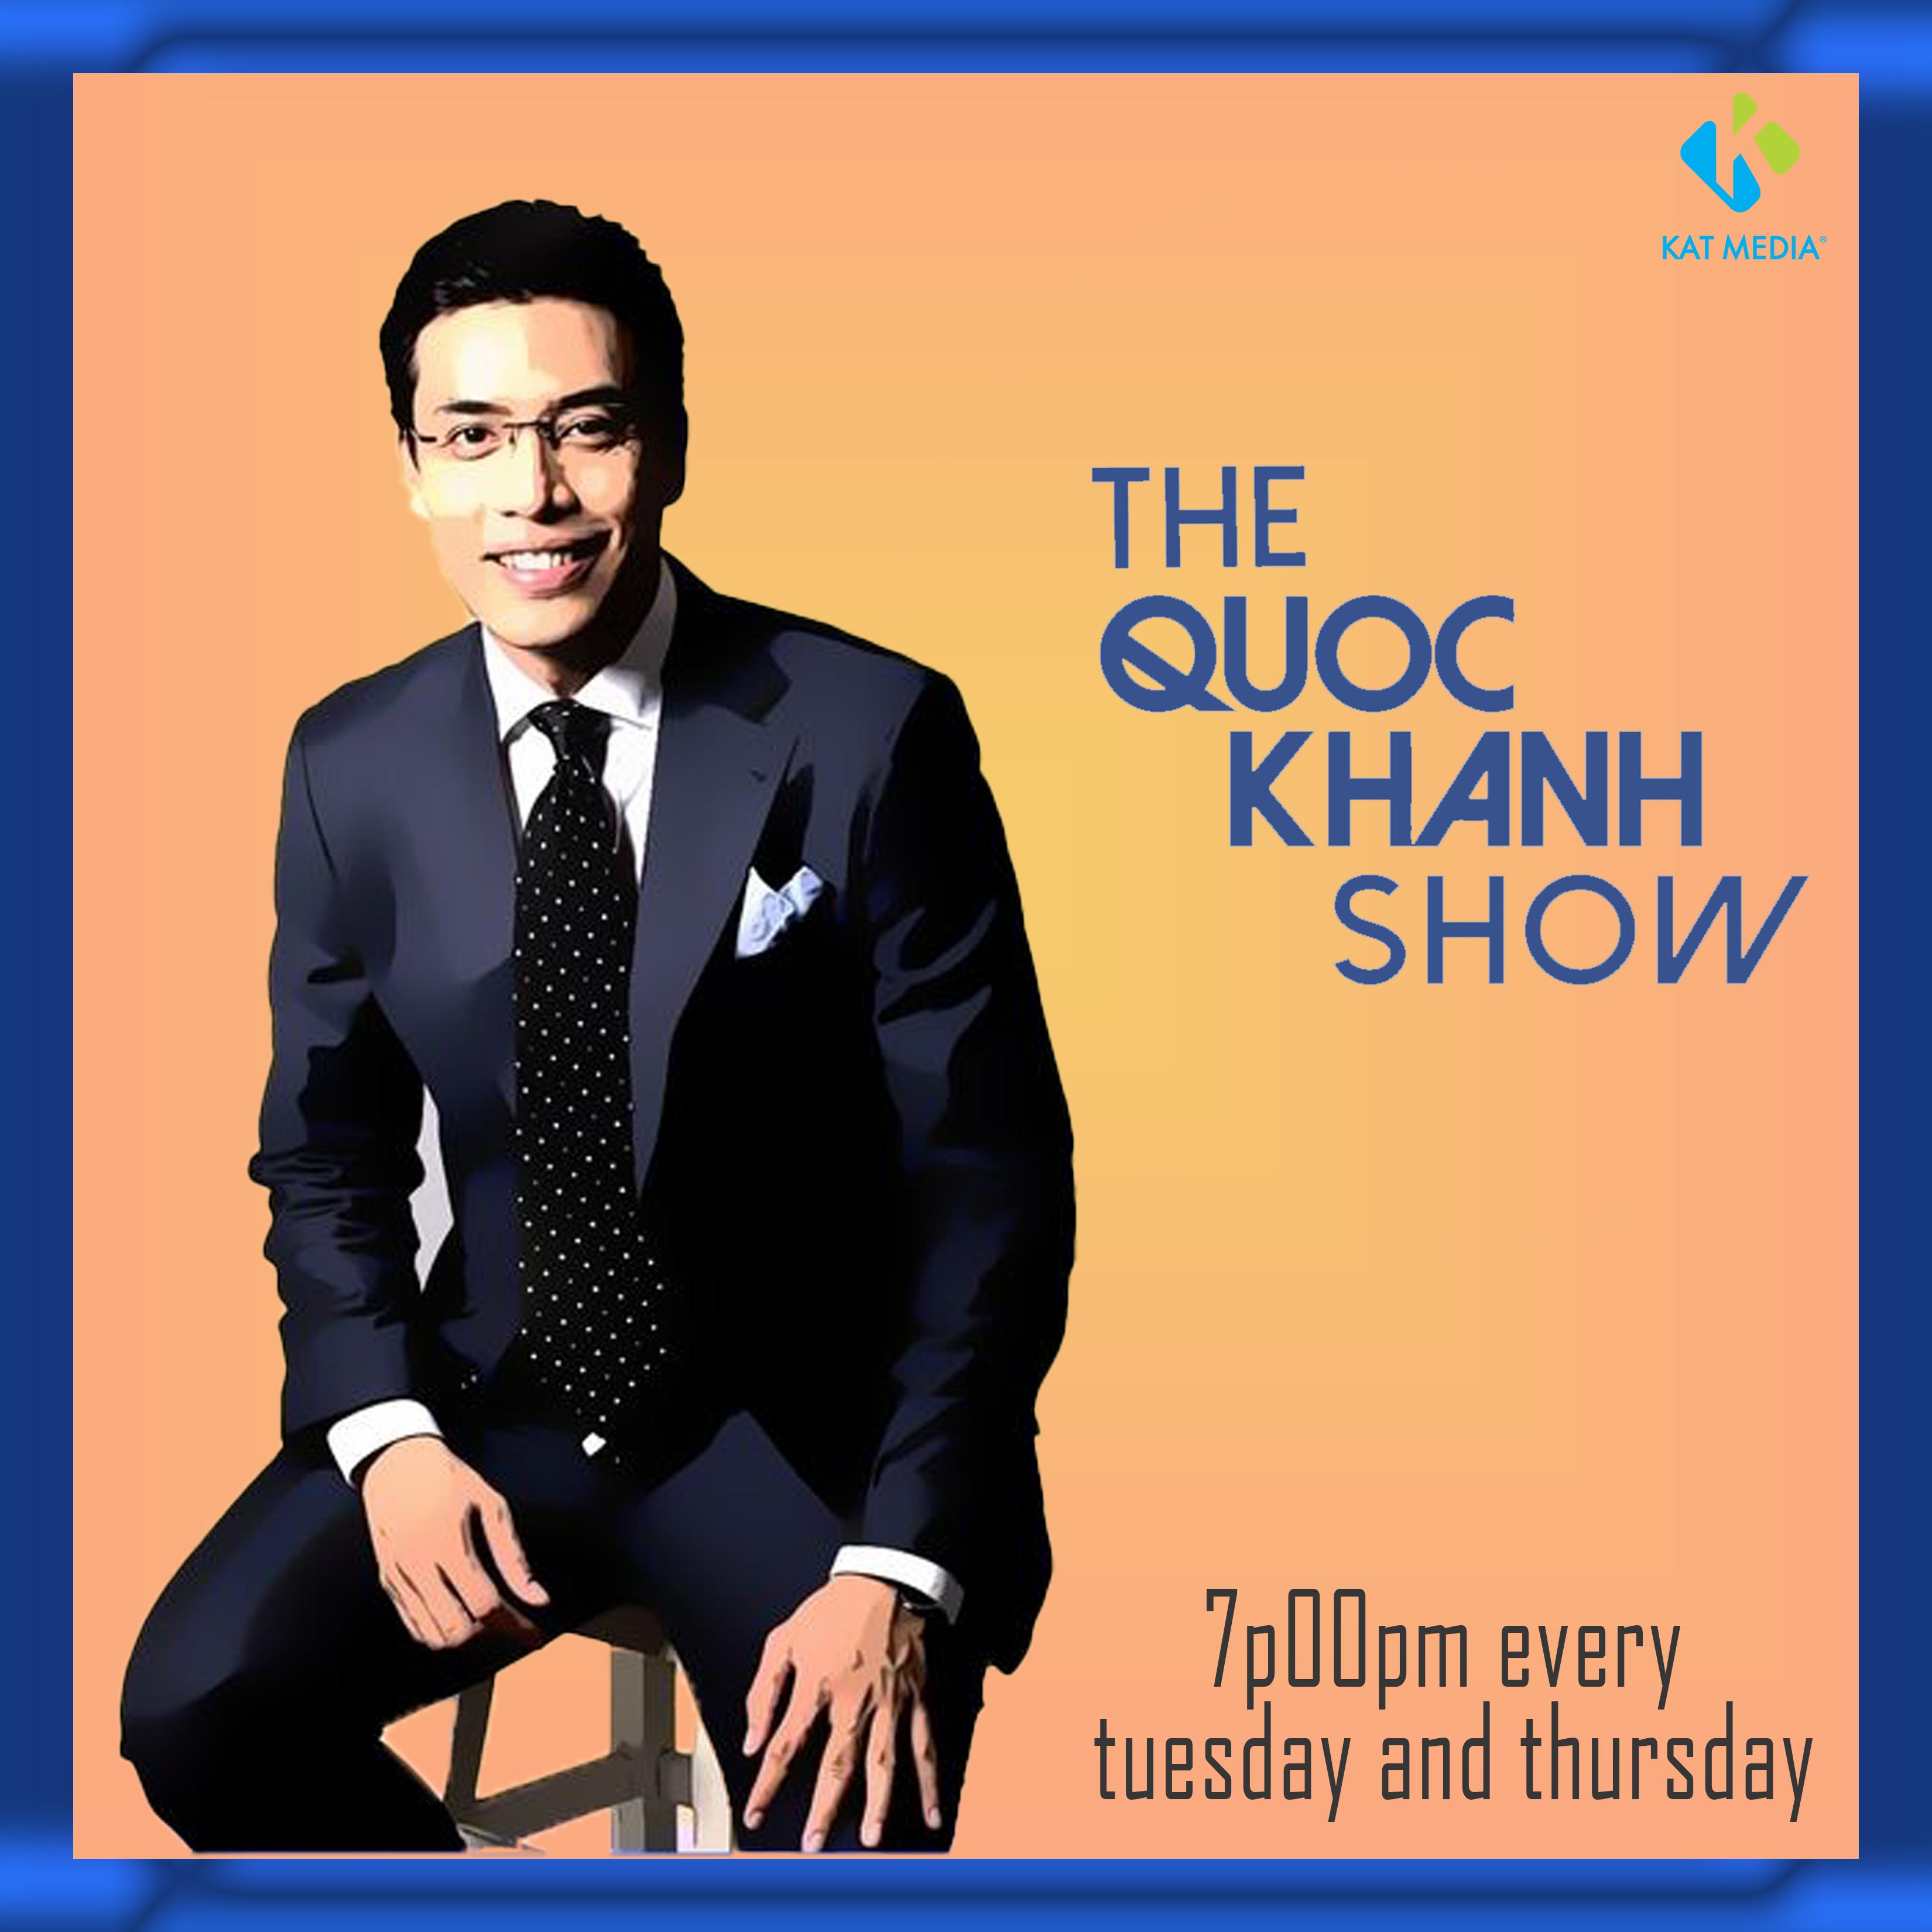 The Quoc Khanh Show show art